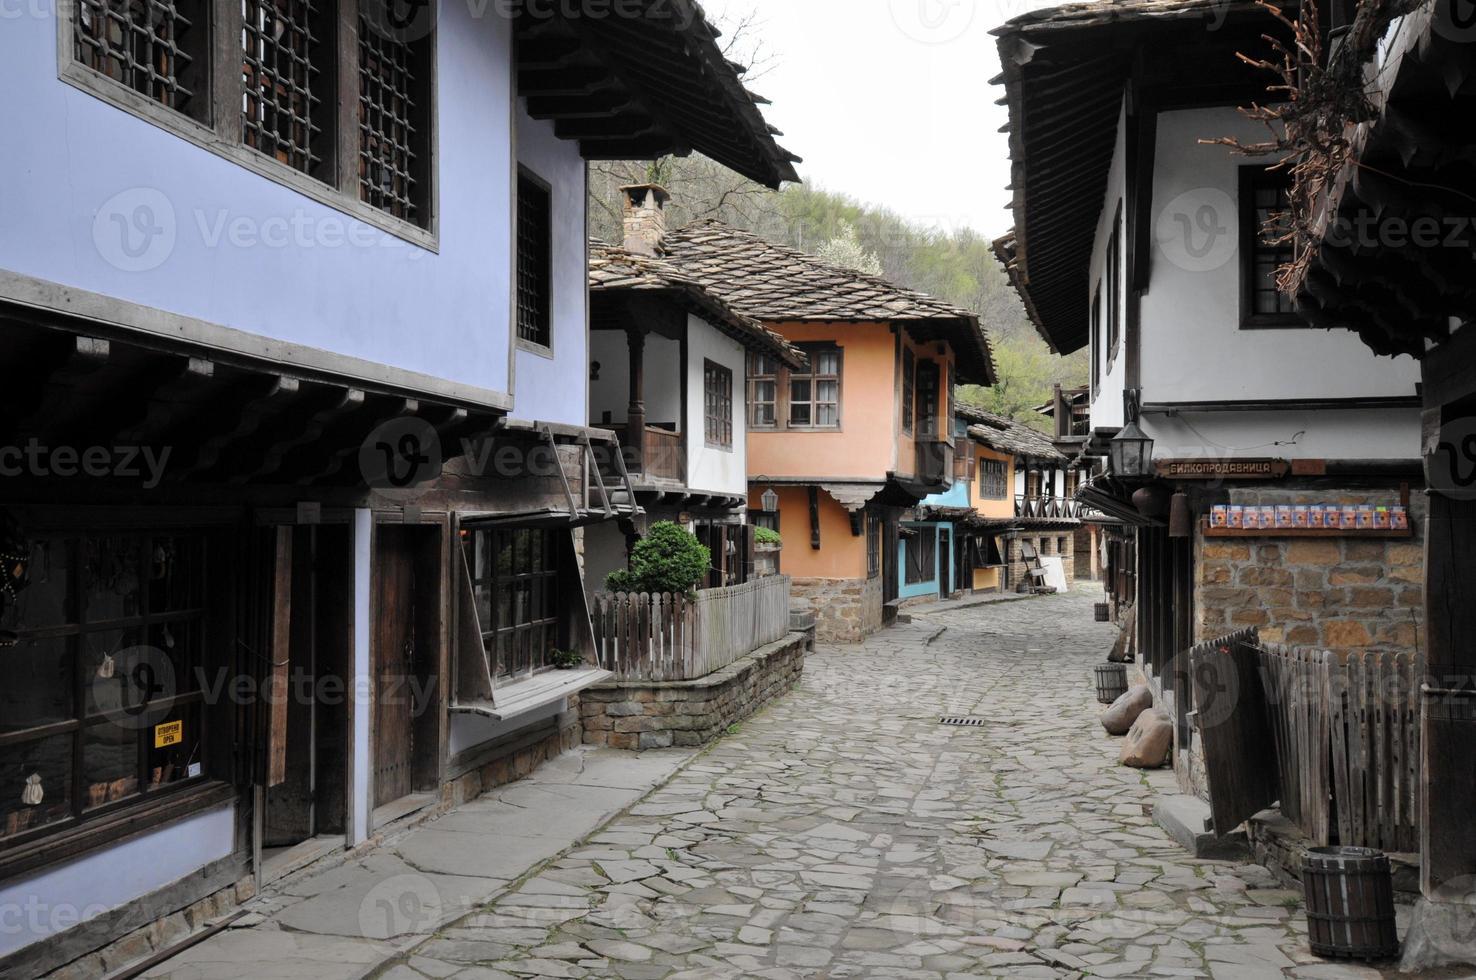 Ancienne architecture bulgare typique, Etara, Bulgarie photo